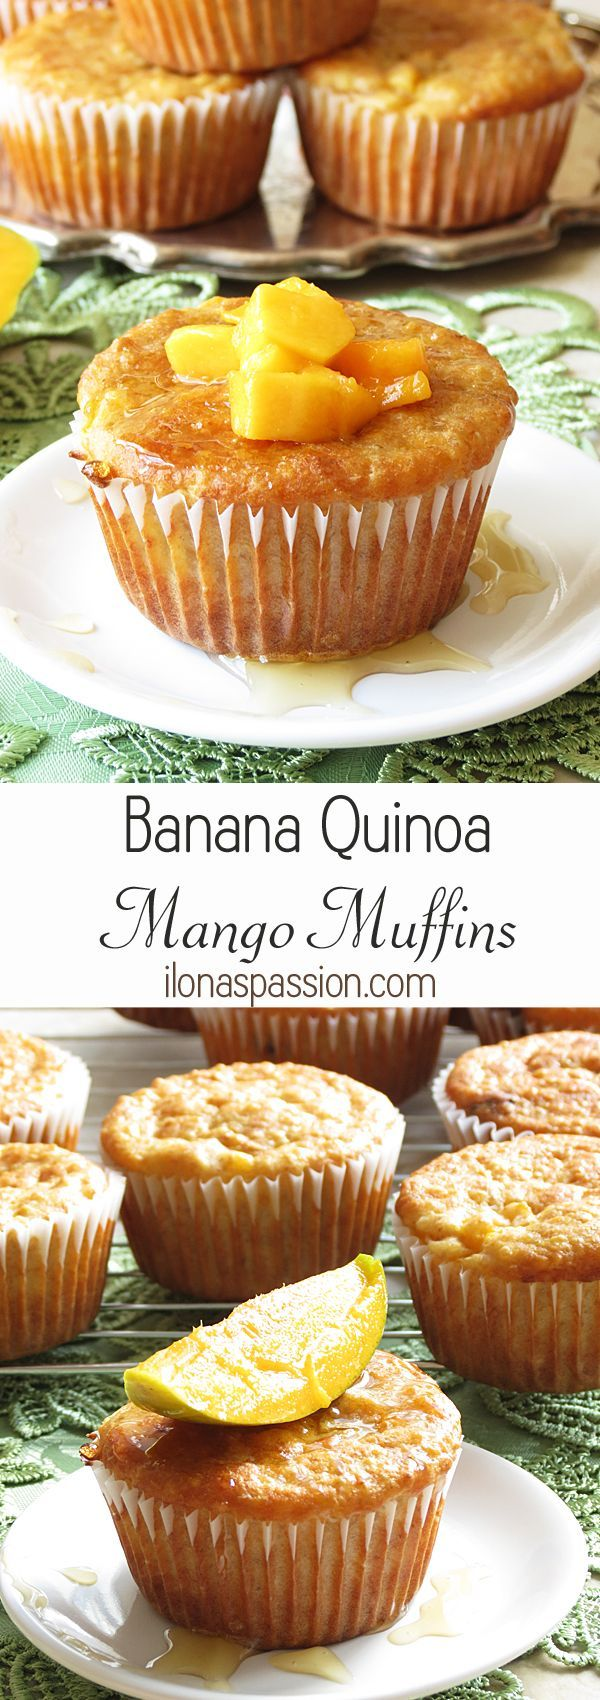 Banana Quinoa Mango Muffins by http://ilonaspassion.com #quinoa #mangomuffins…